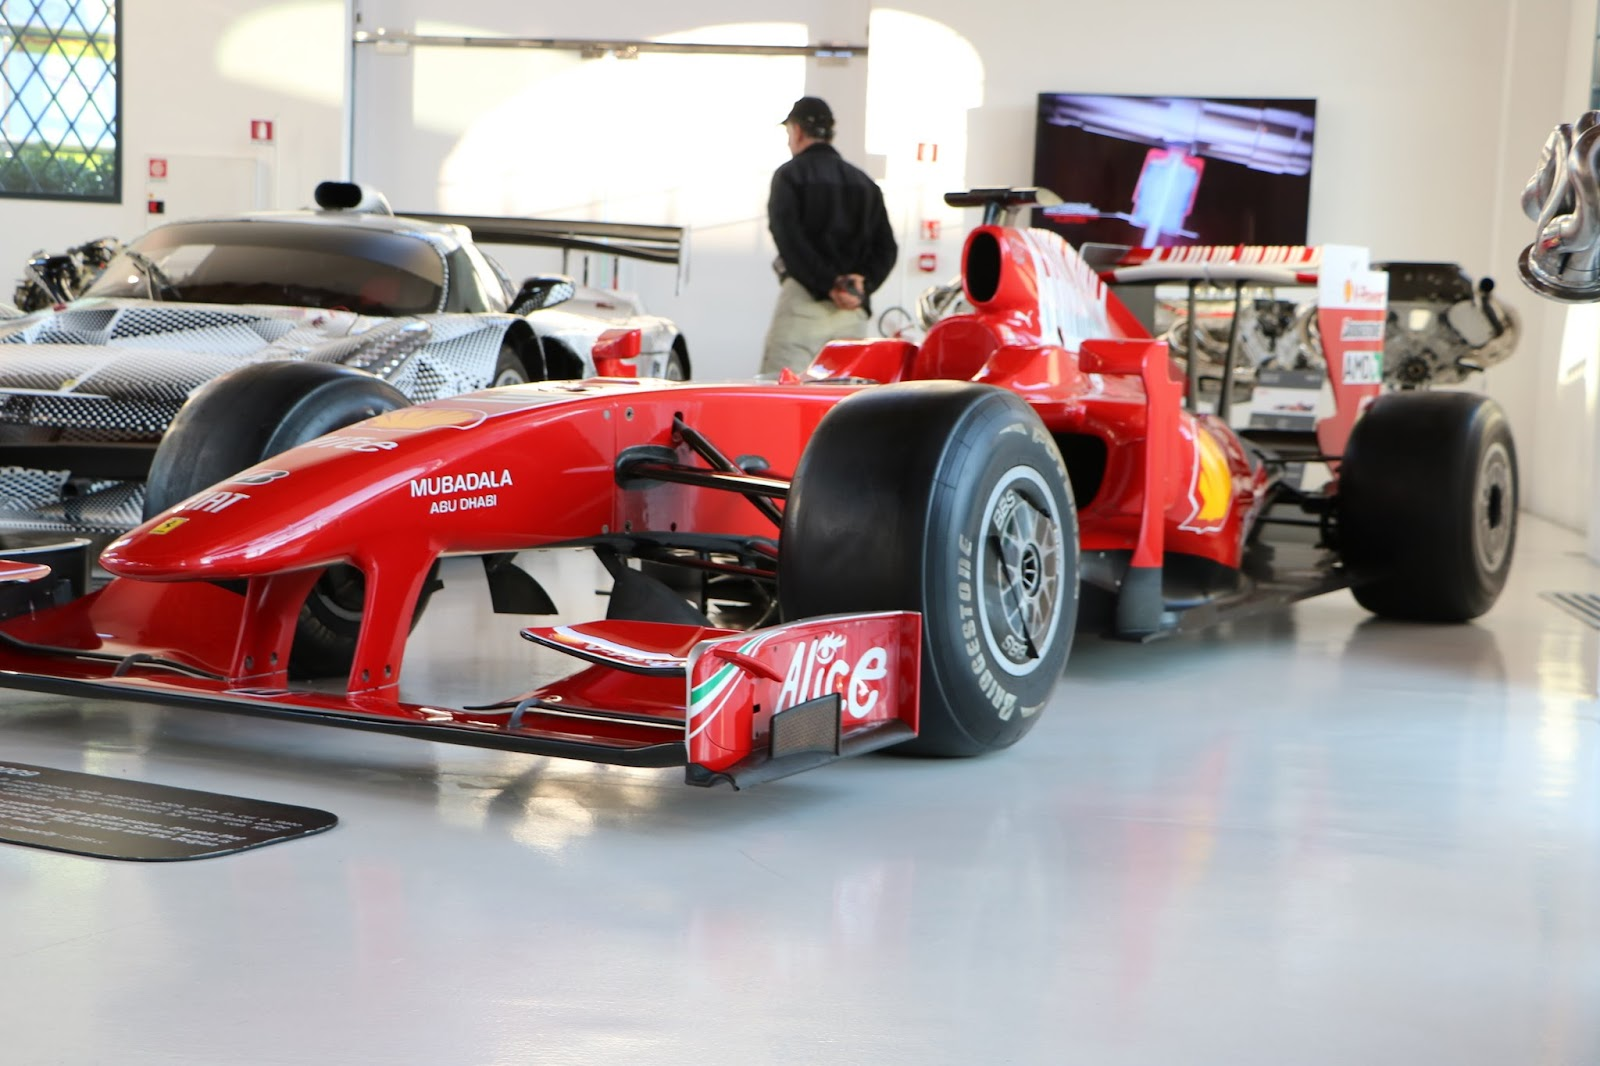 Modena - Enzo Museum 0268 - Massa F1 Car.jpg